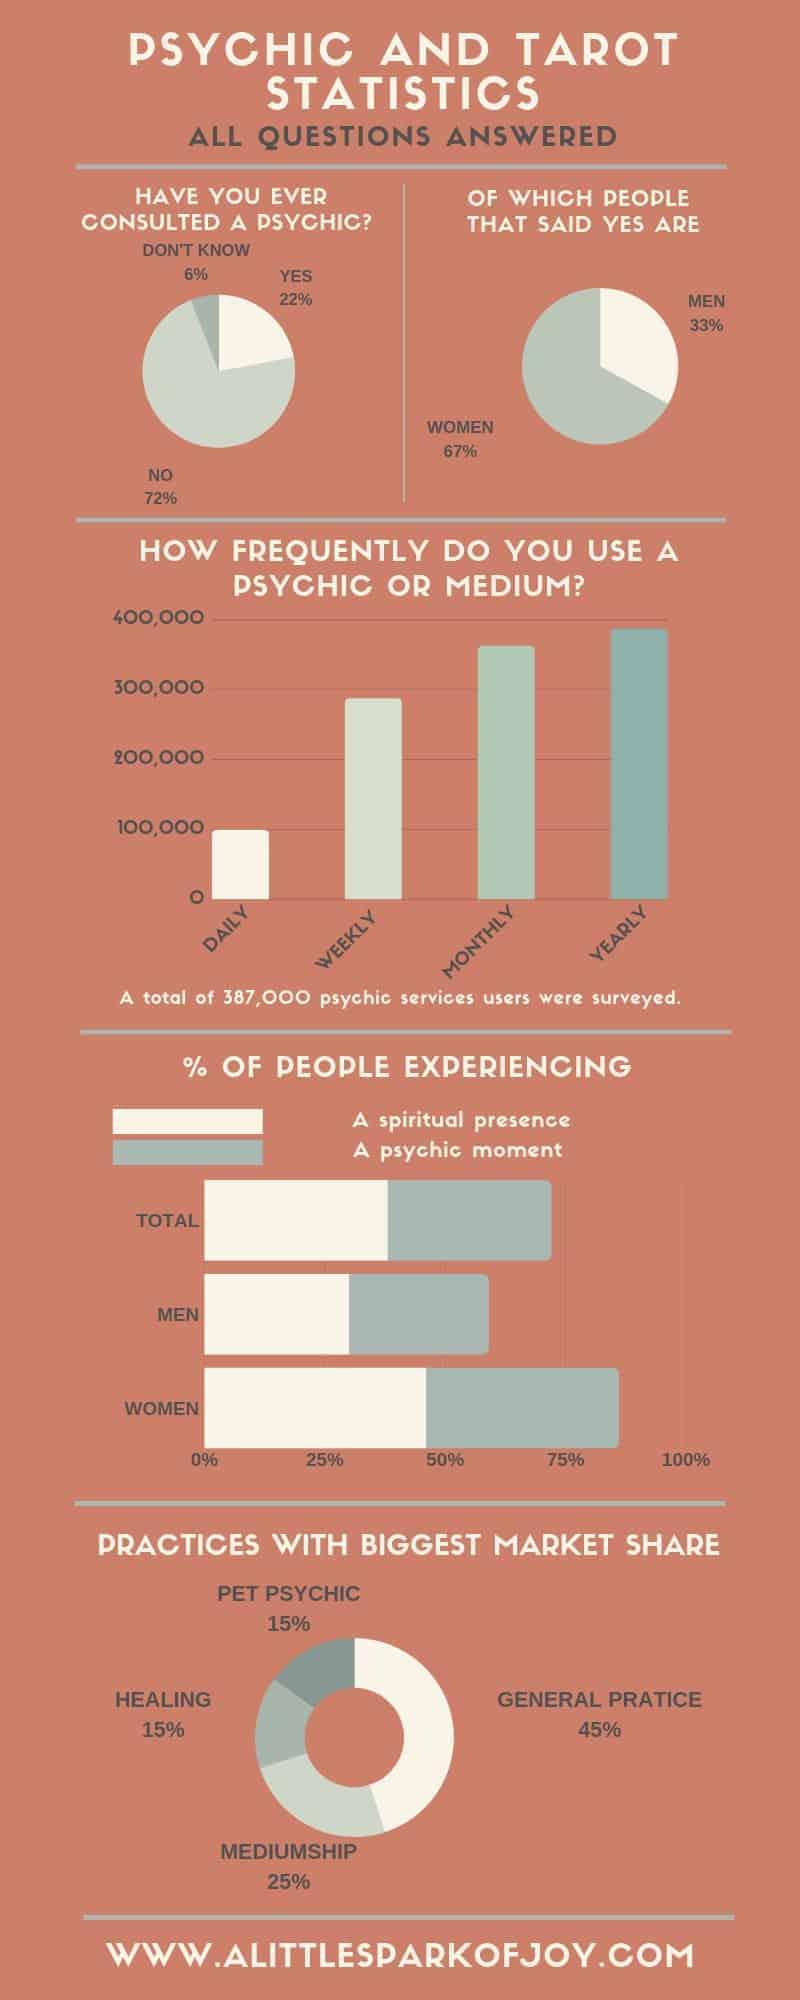 psychic tarot statistics infographic